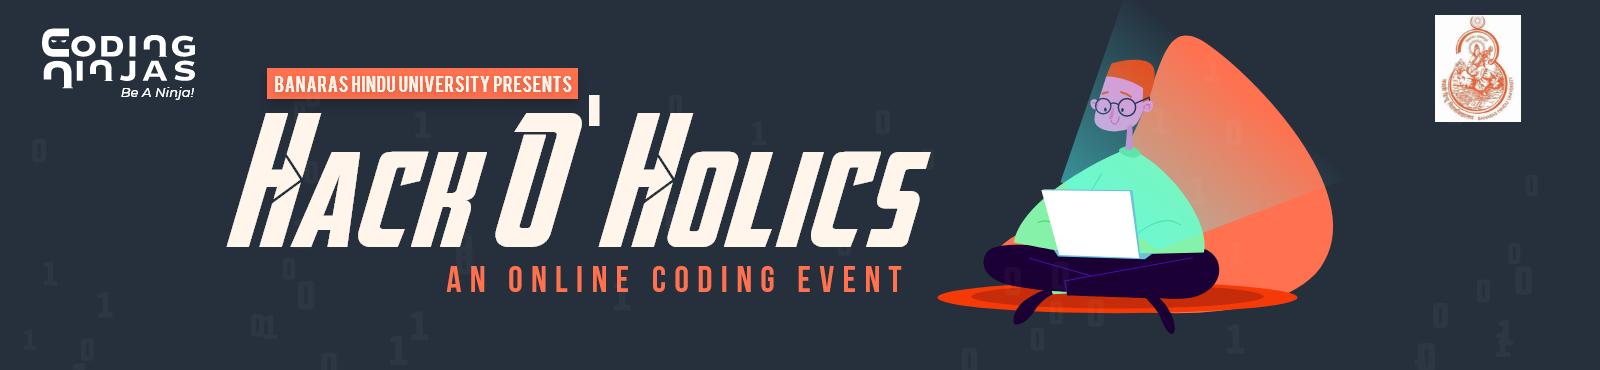 Hack O' Holics